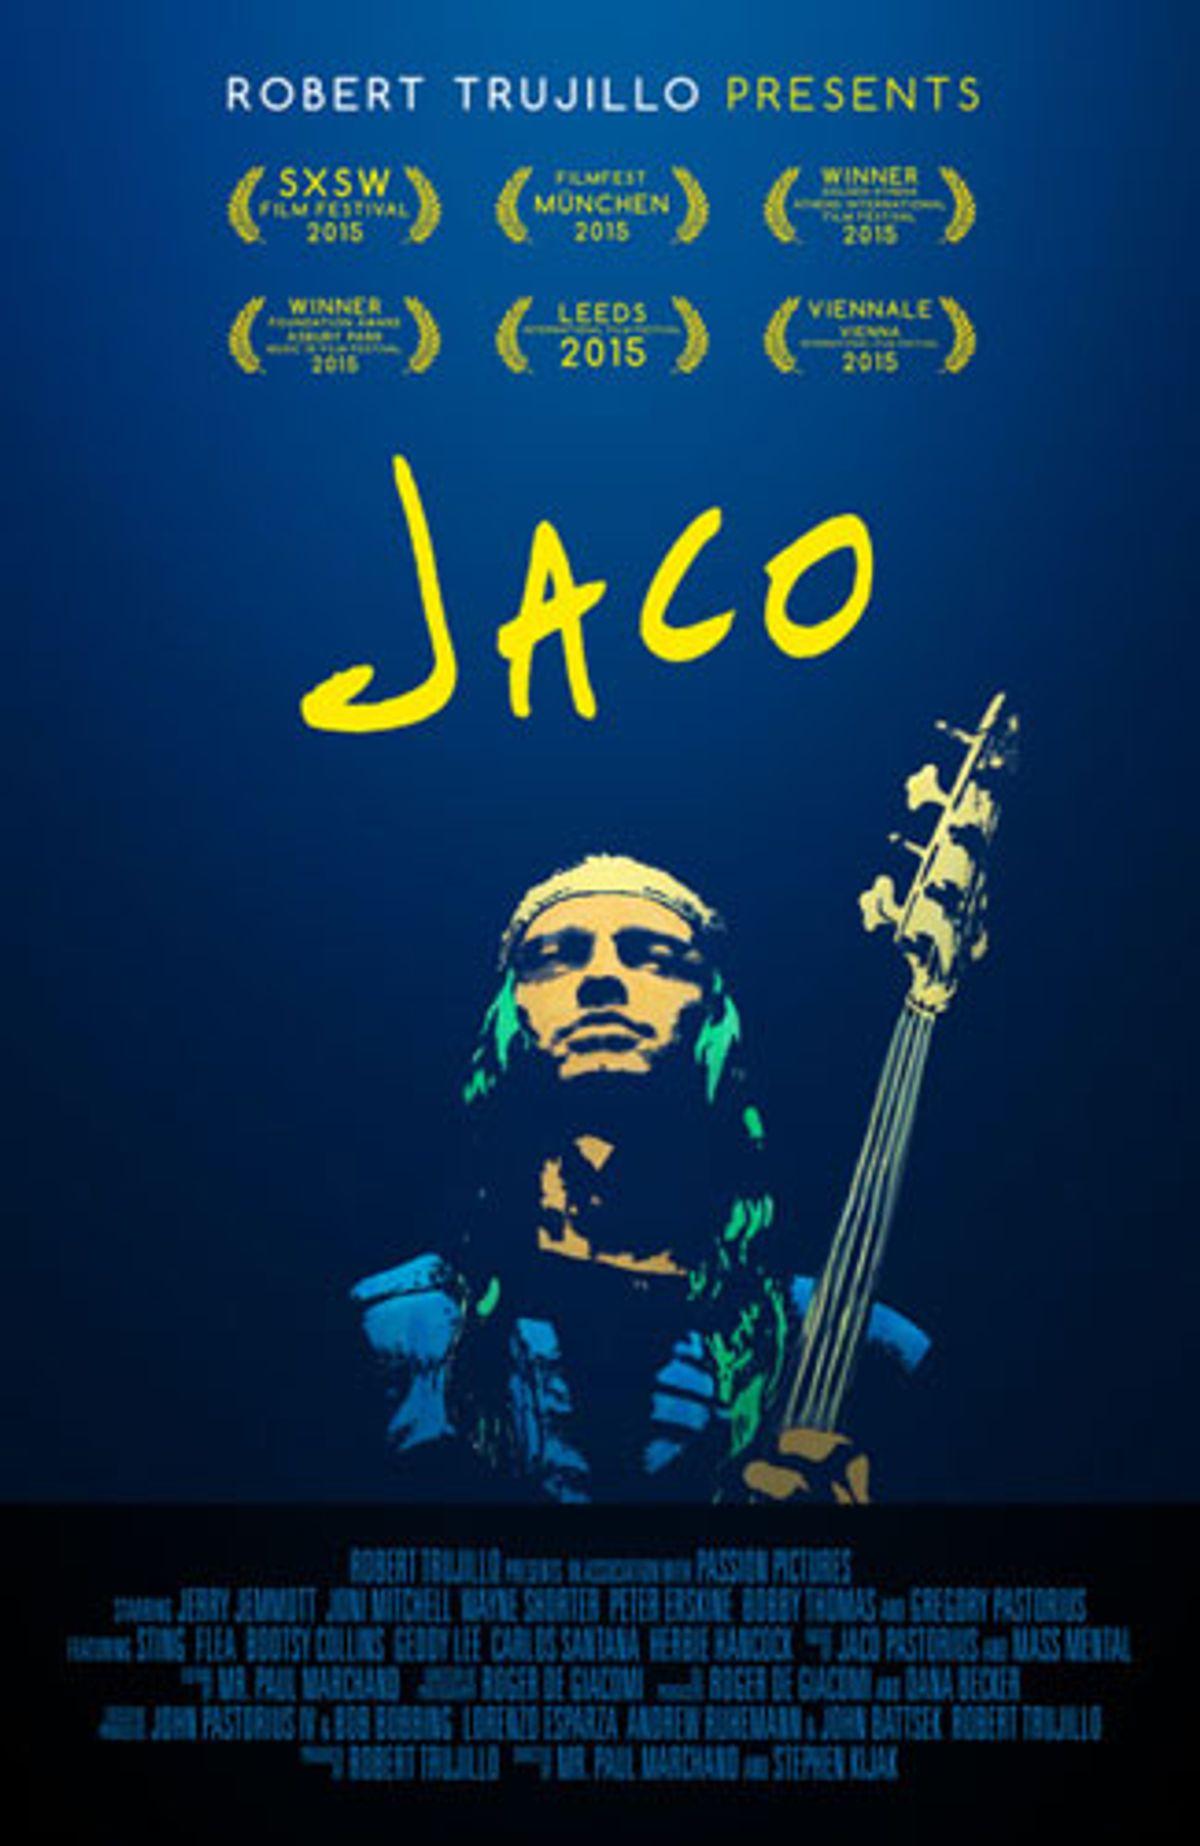 Robert Trujillo on Making 'Jaco'